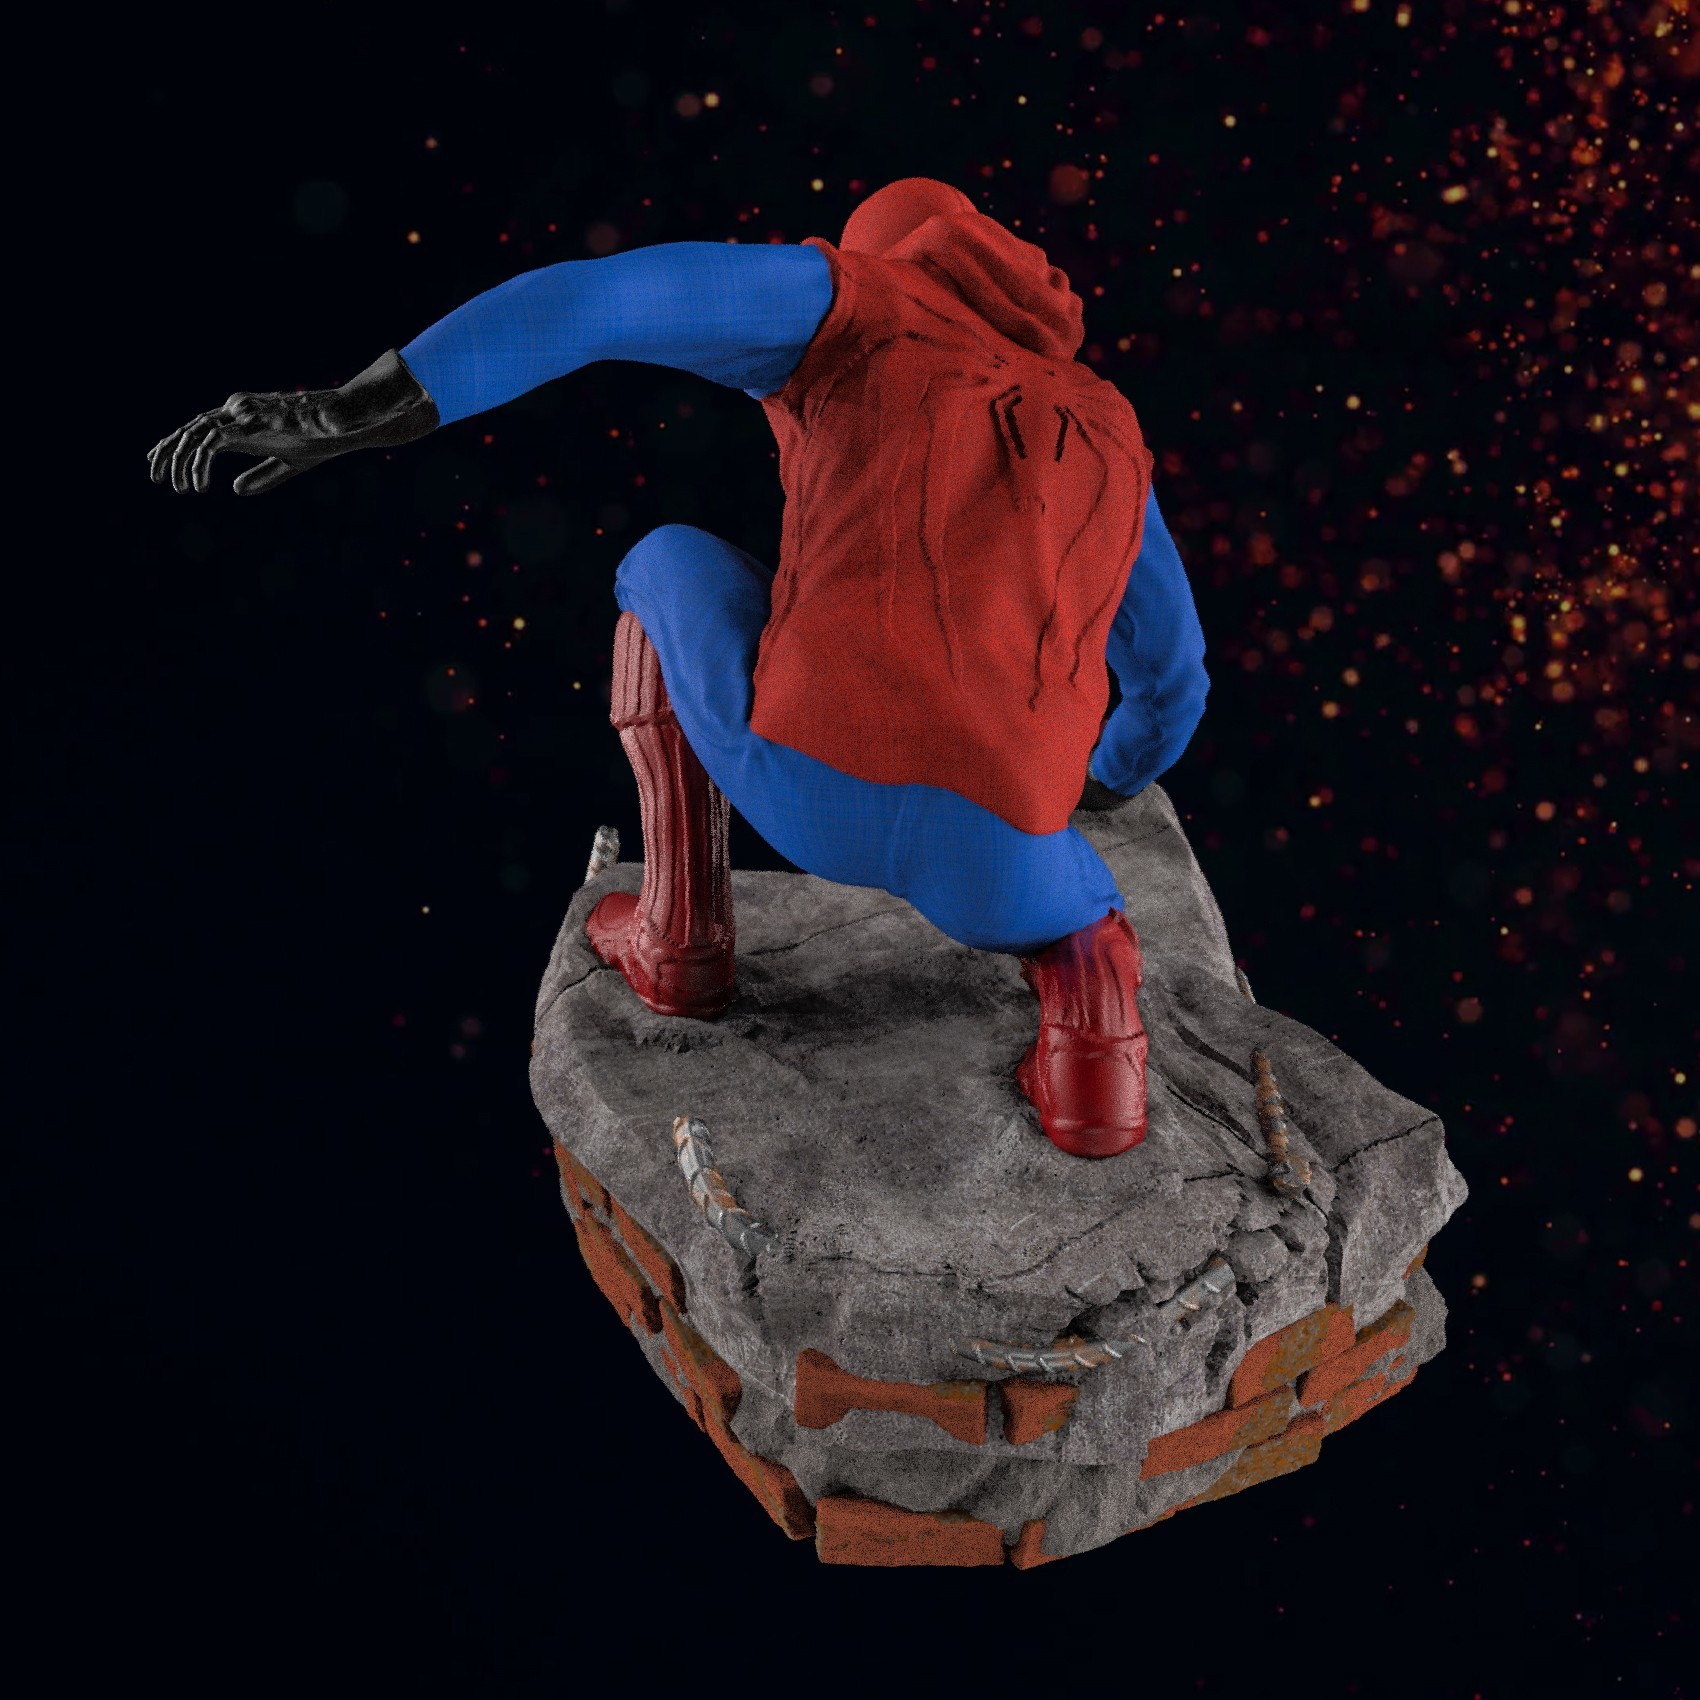 13.jpg Download STL file Spider-Man Homemade Suit • Design to 3D print, tolgaaxu